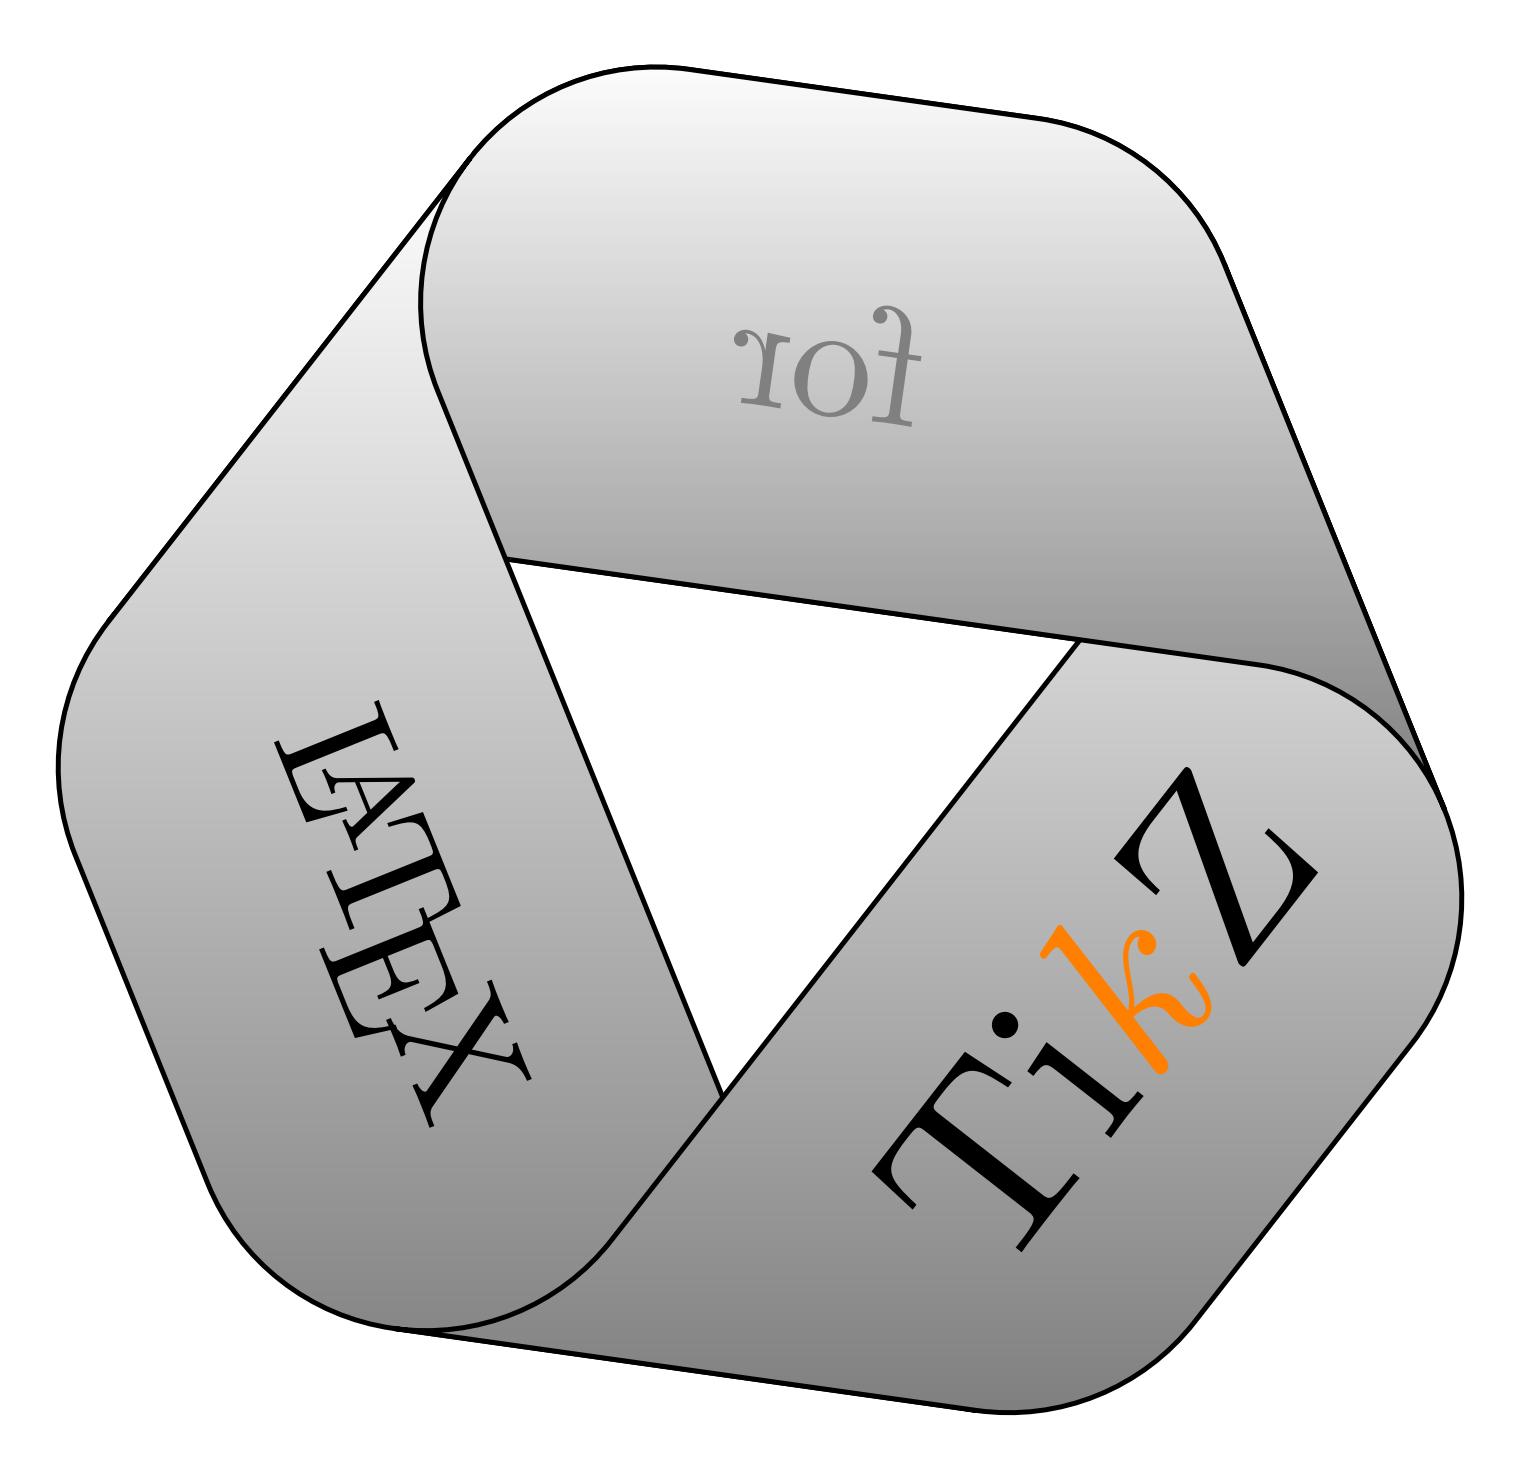 TiKZ 绘制的莫比乌斯带